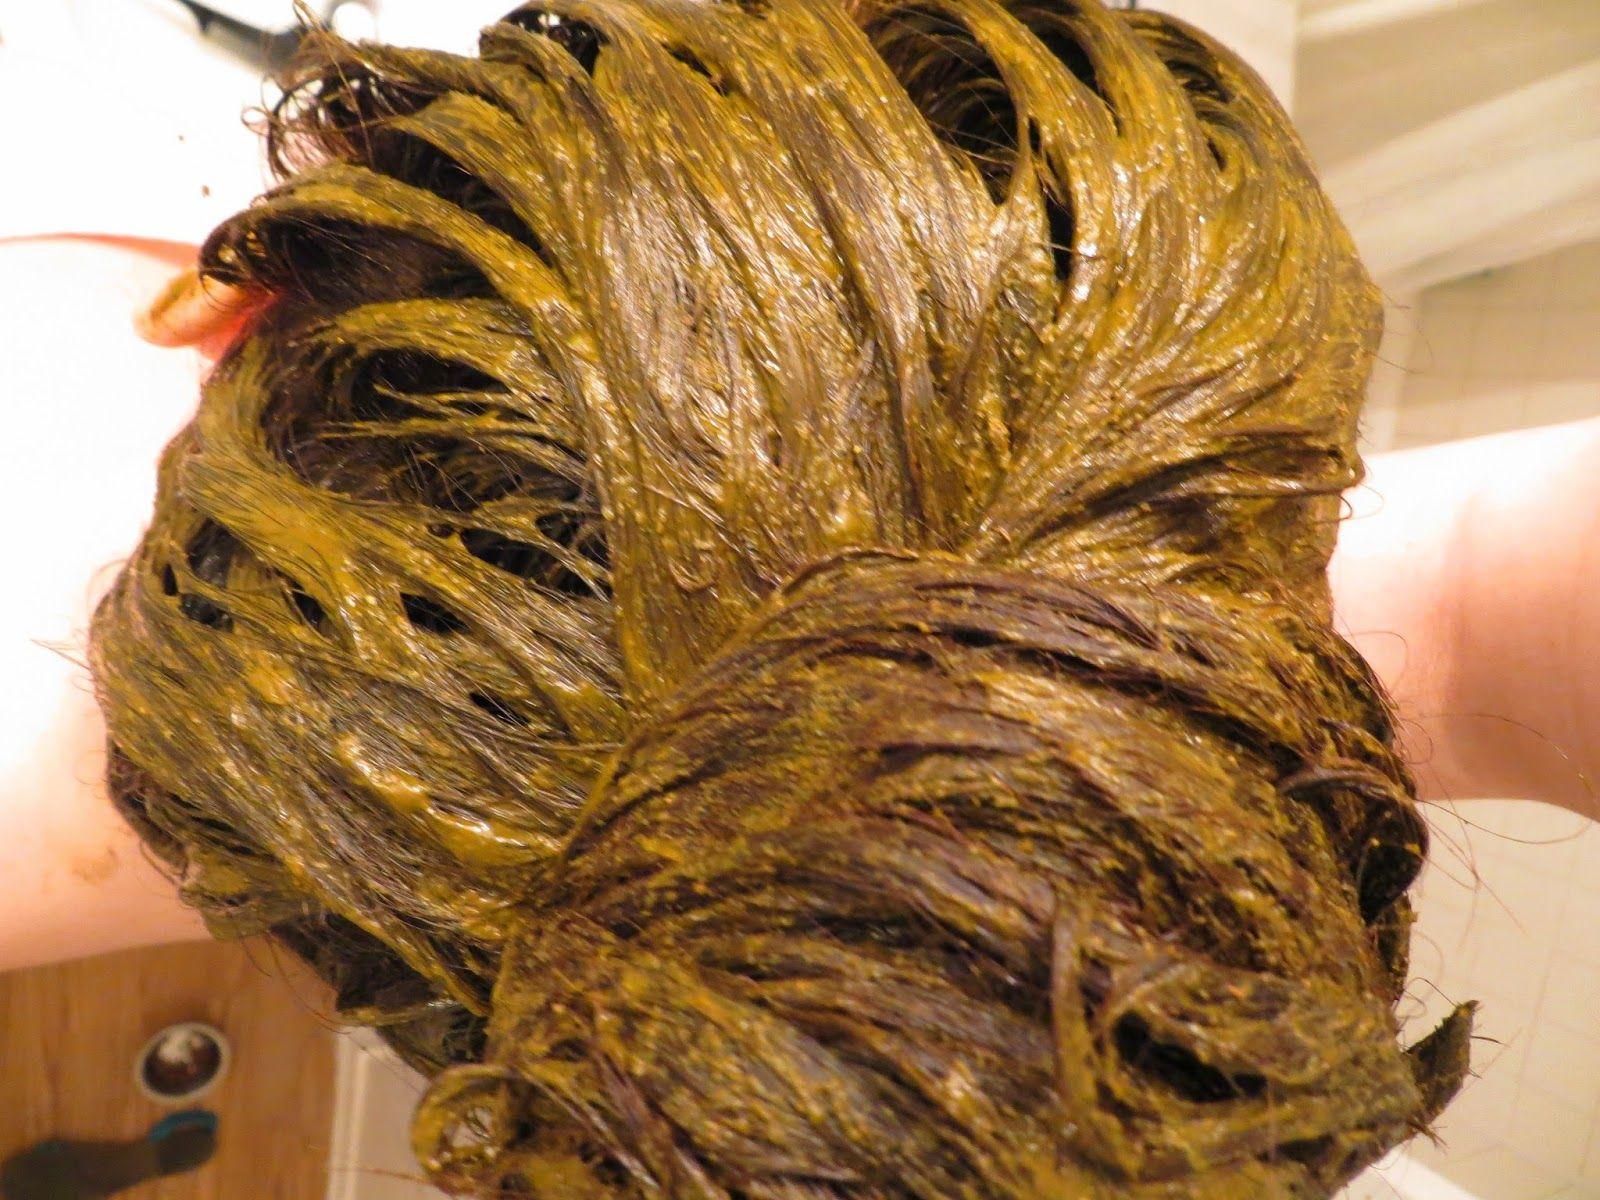 طريقة صبغ الشعر بالحناء Henna Hair Dyes Hair Mask Recipe Hair